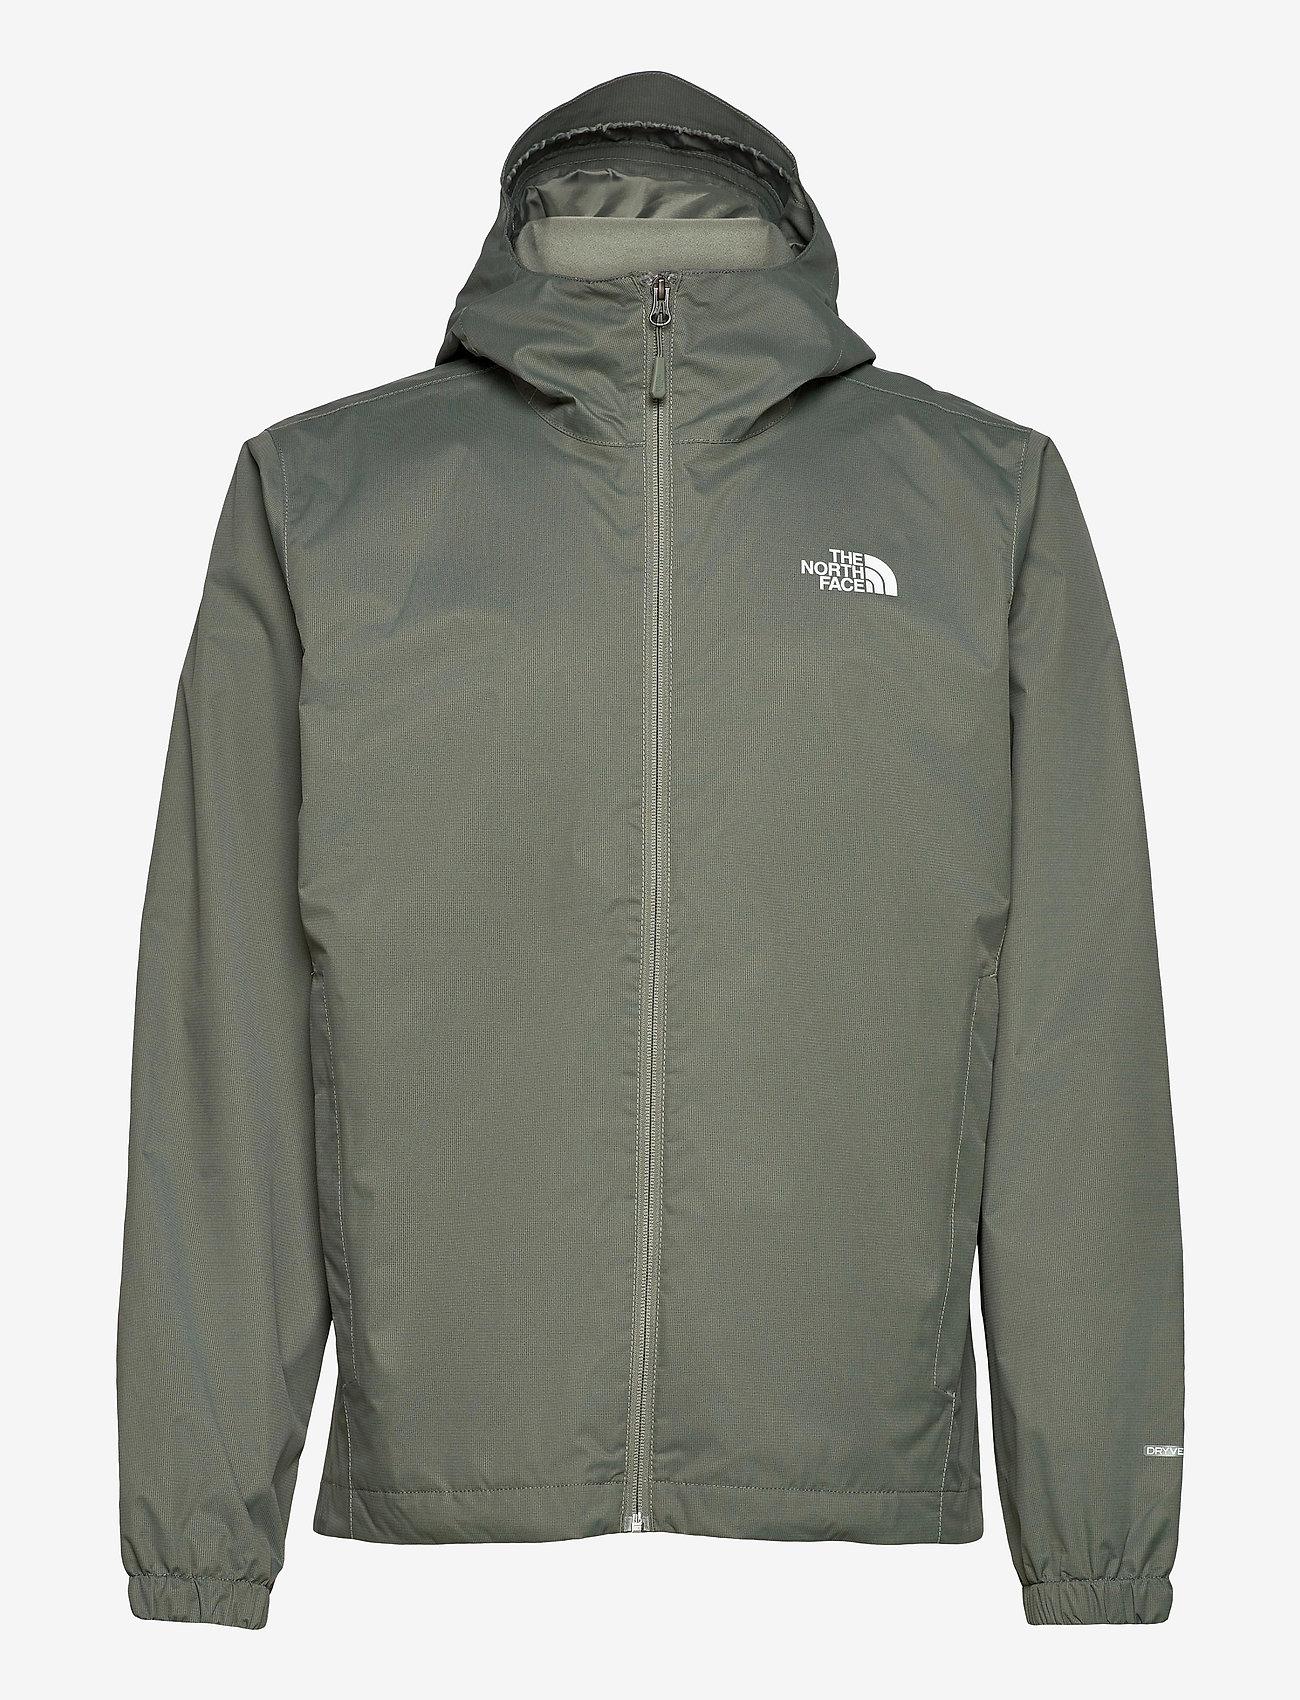 The North Face - M QUEST JACKET - veste sport - agave green black heather - 0